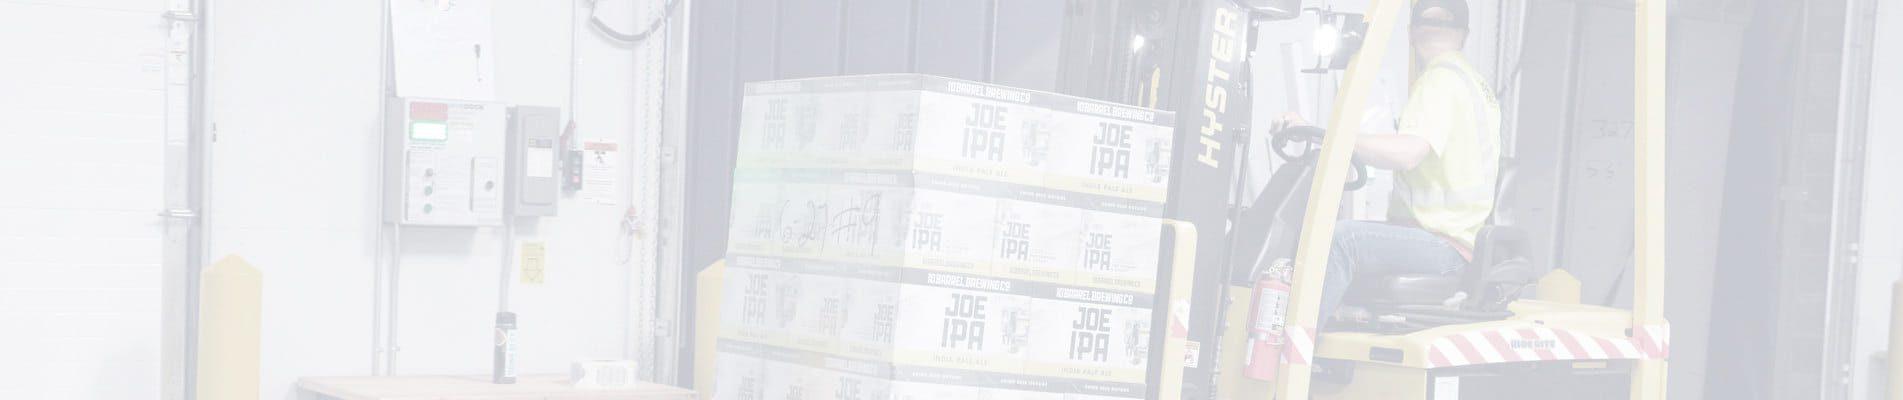 integrar RFID en la industria